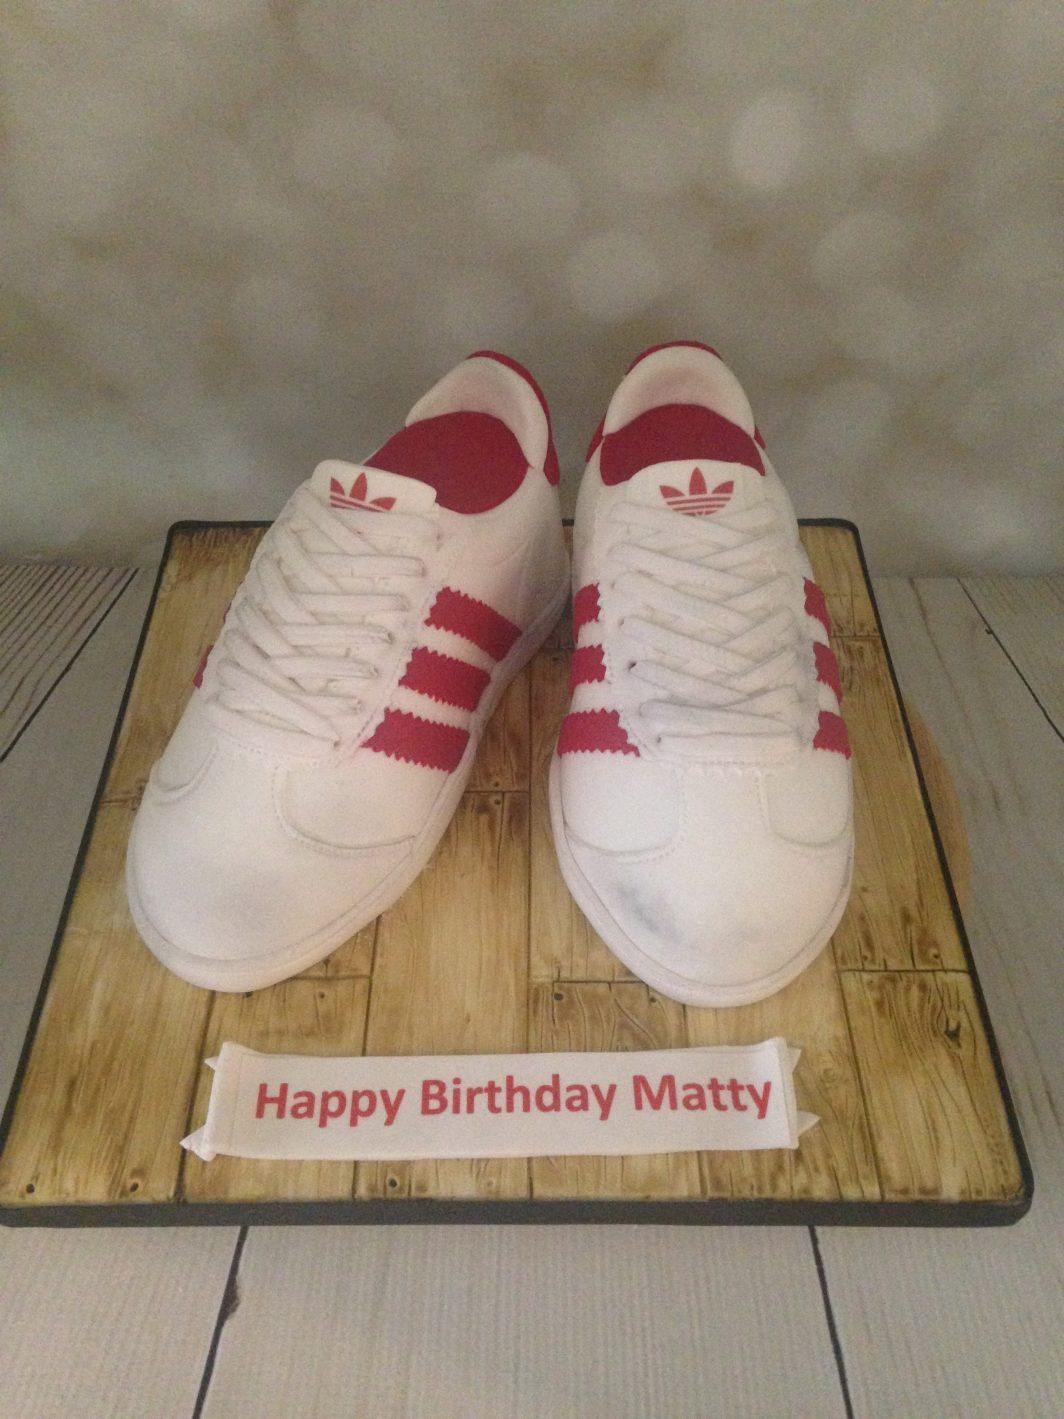 Adidas Trainers Birthday Cake Shoes